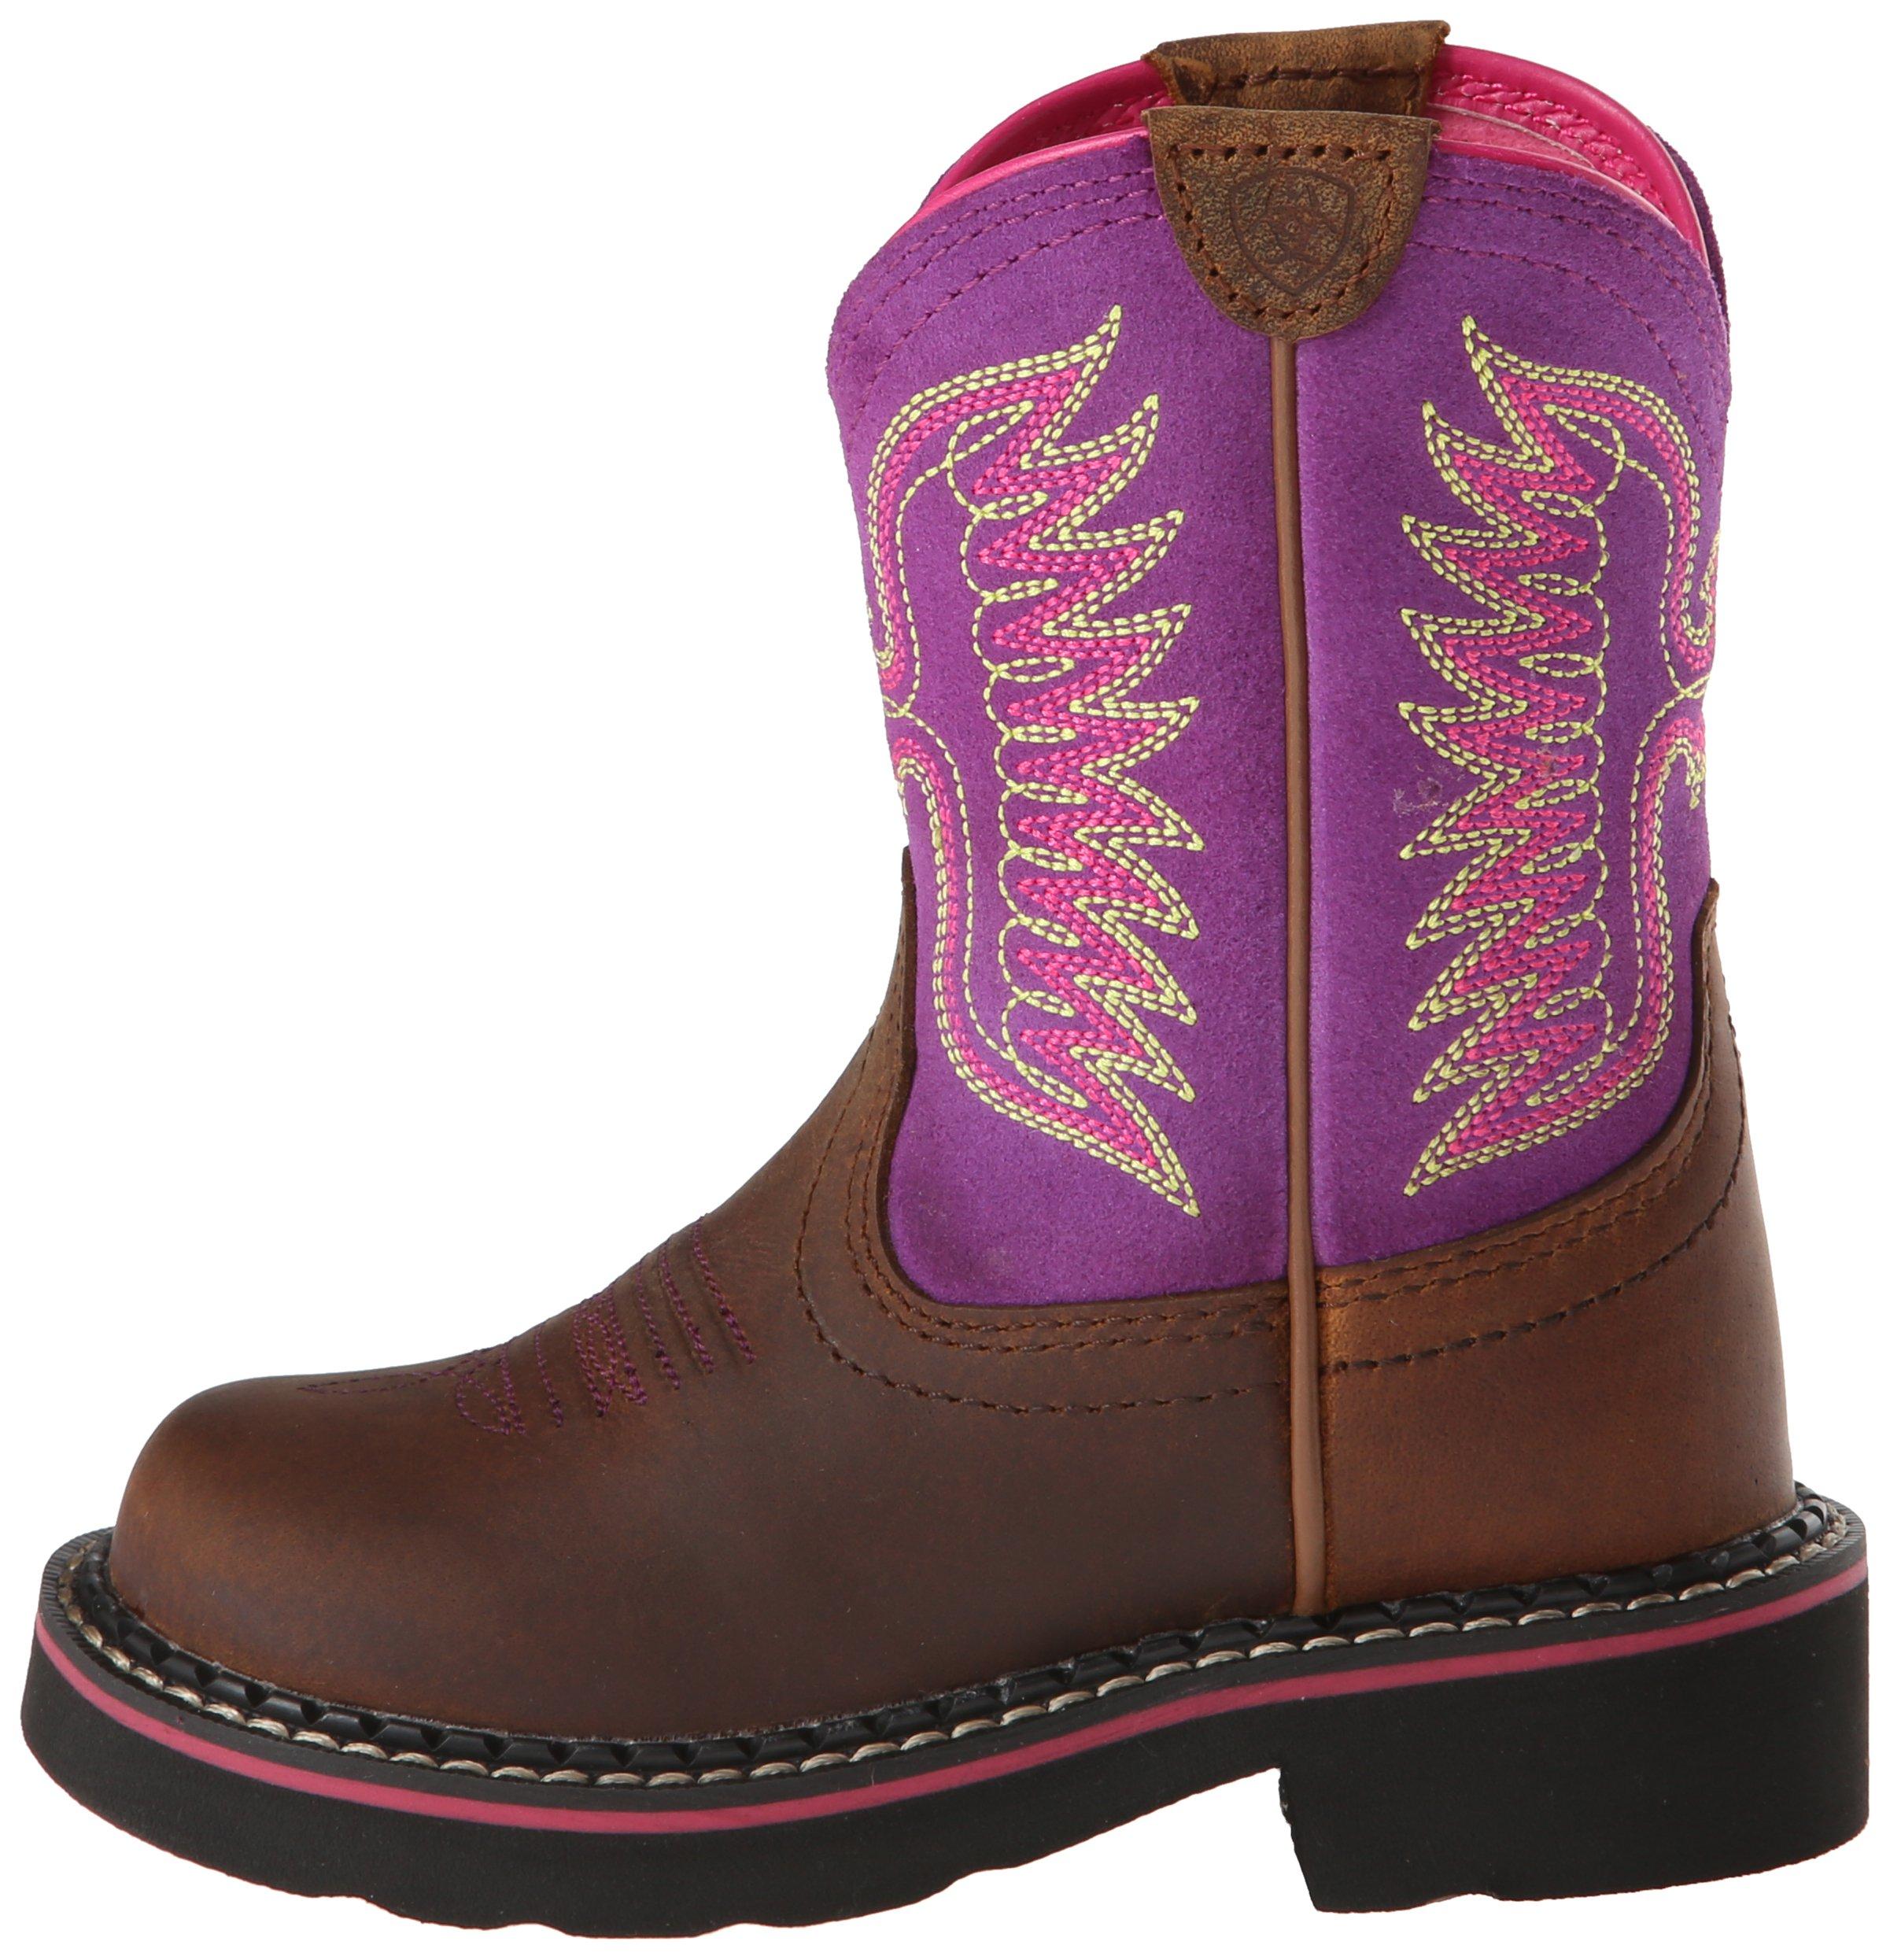 Kids' Fatbaby Thunderbird Western Cowboy Boot, Powder Brown/Amethyst, 12.5 M US Little Kid by ARIAT (Image #5)